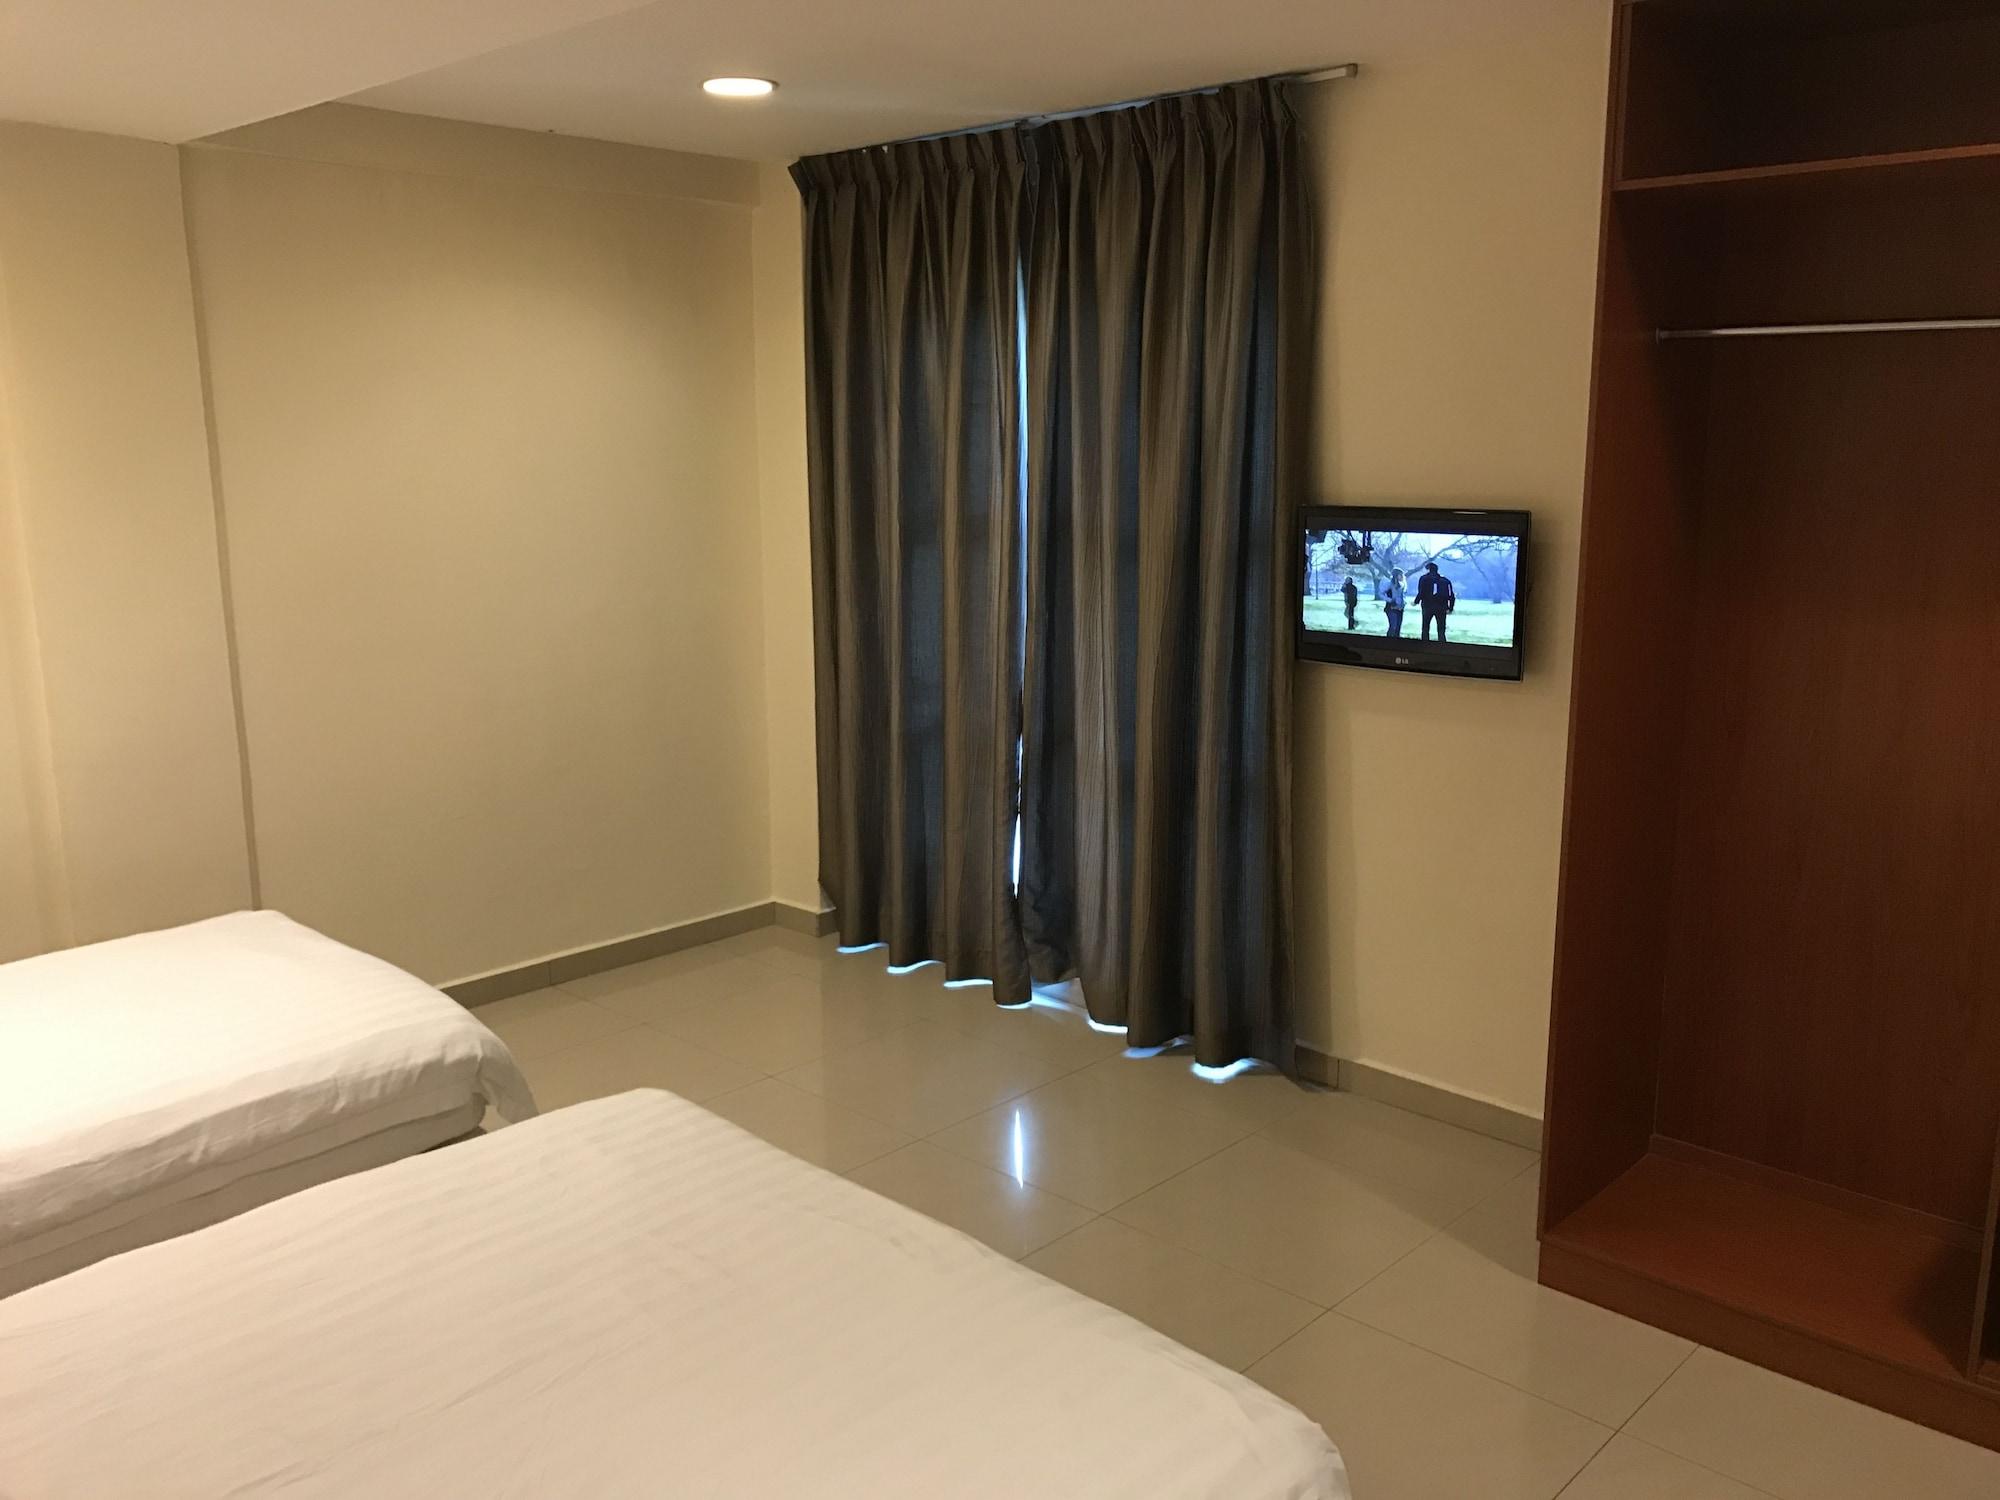 Aeton Hotel, Seremban